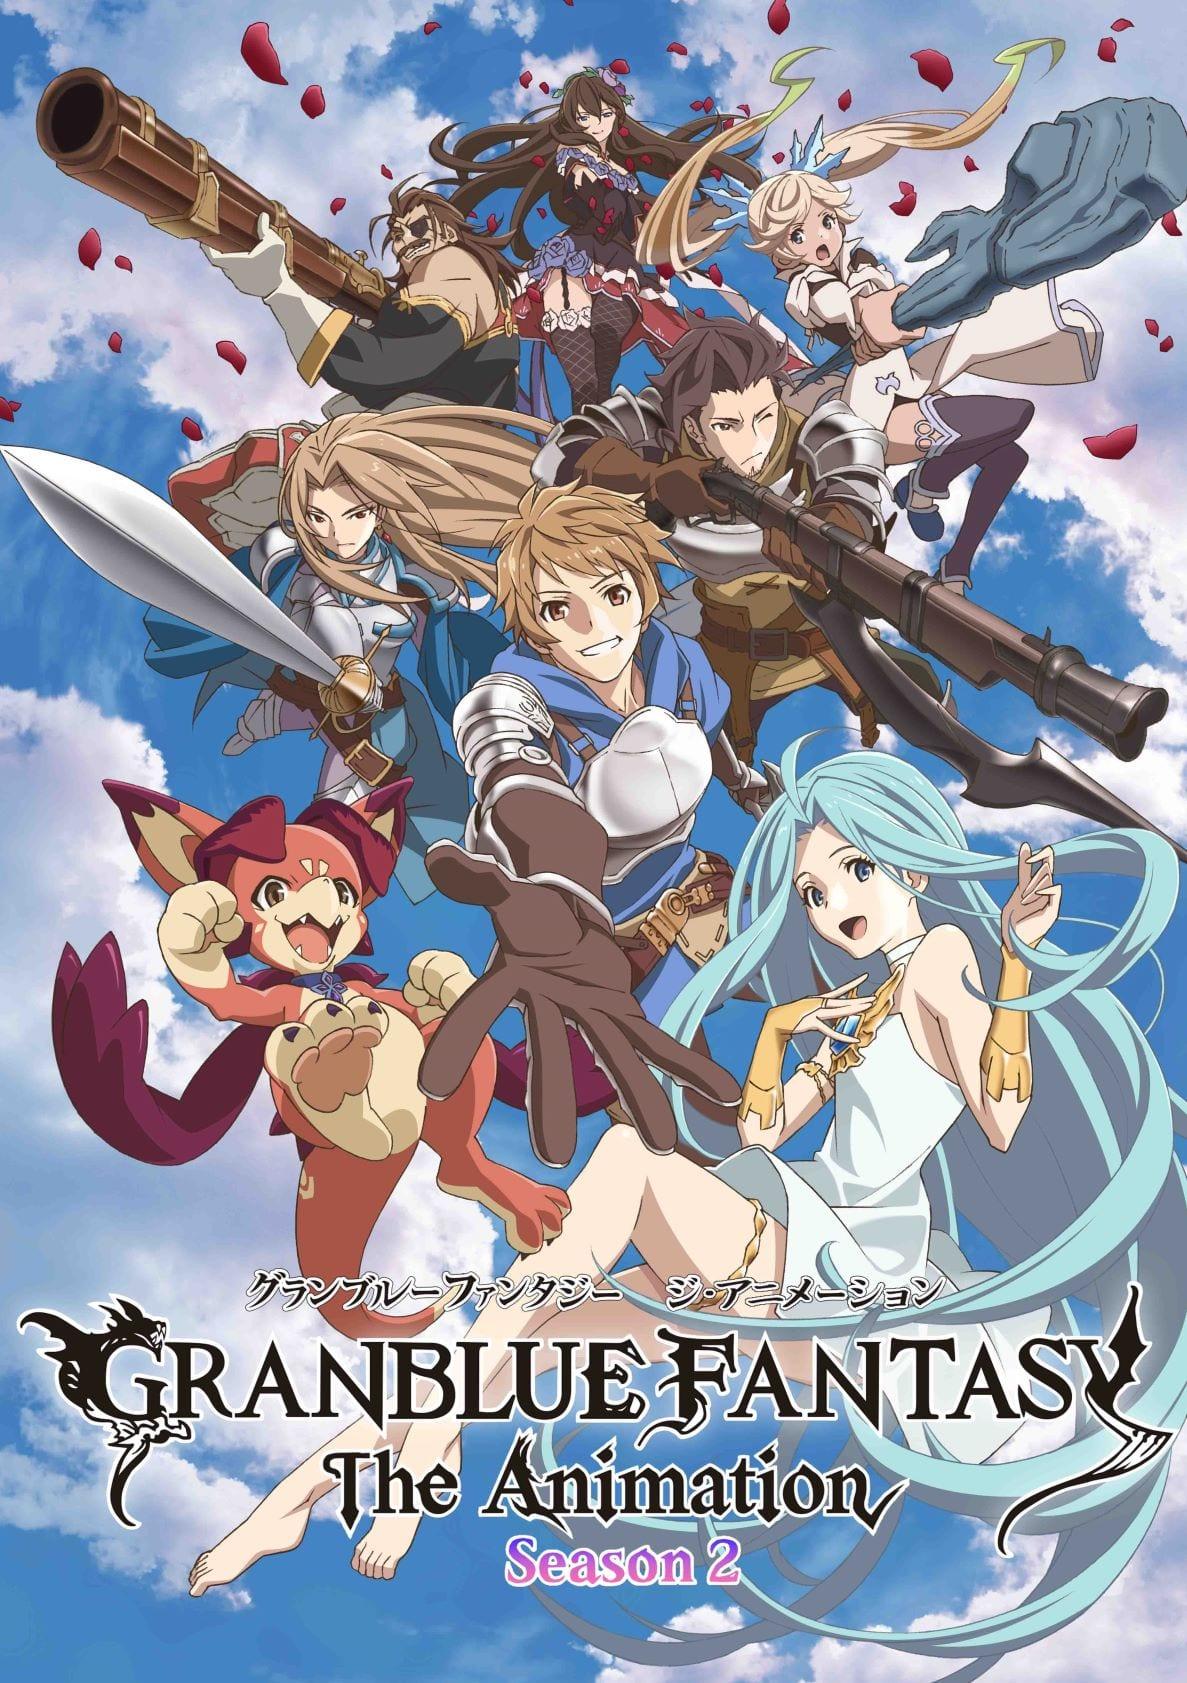 https://mirai.ai/wp-content/uploads/Granblue-Fantasy-The-Animation-Season-2-v2.jpg